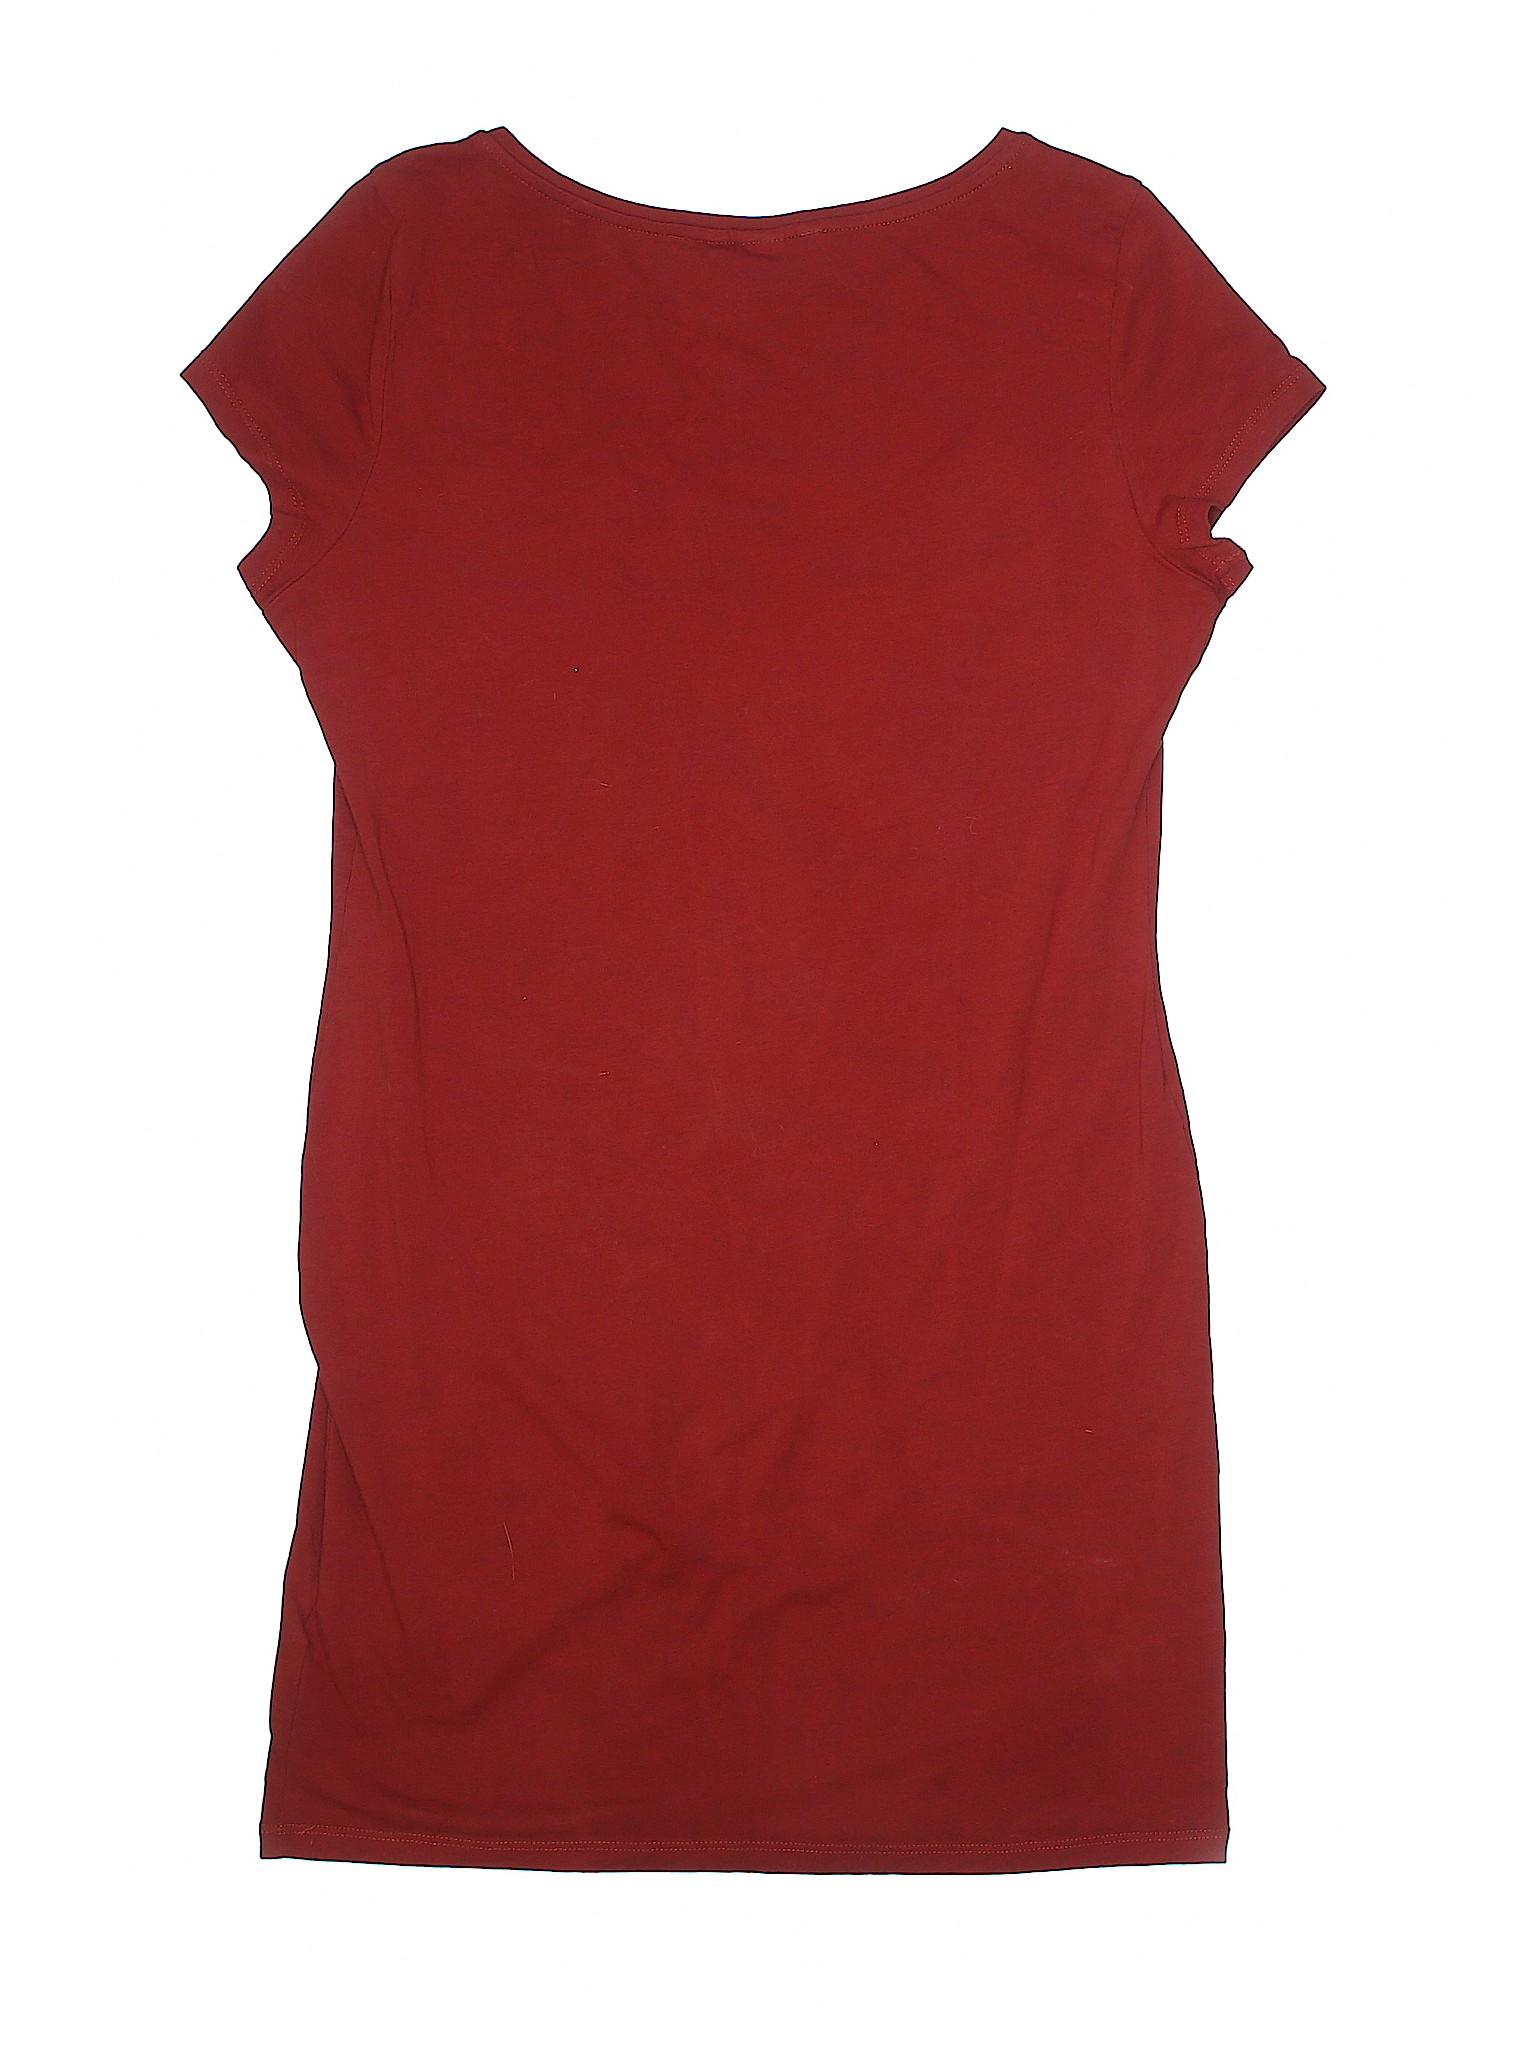 Casual H Dress winter Boutique amp;M wZq78Fn8